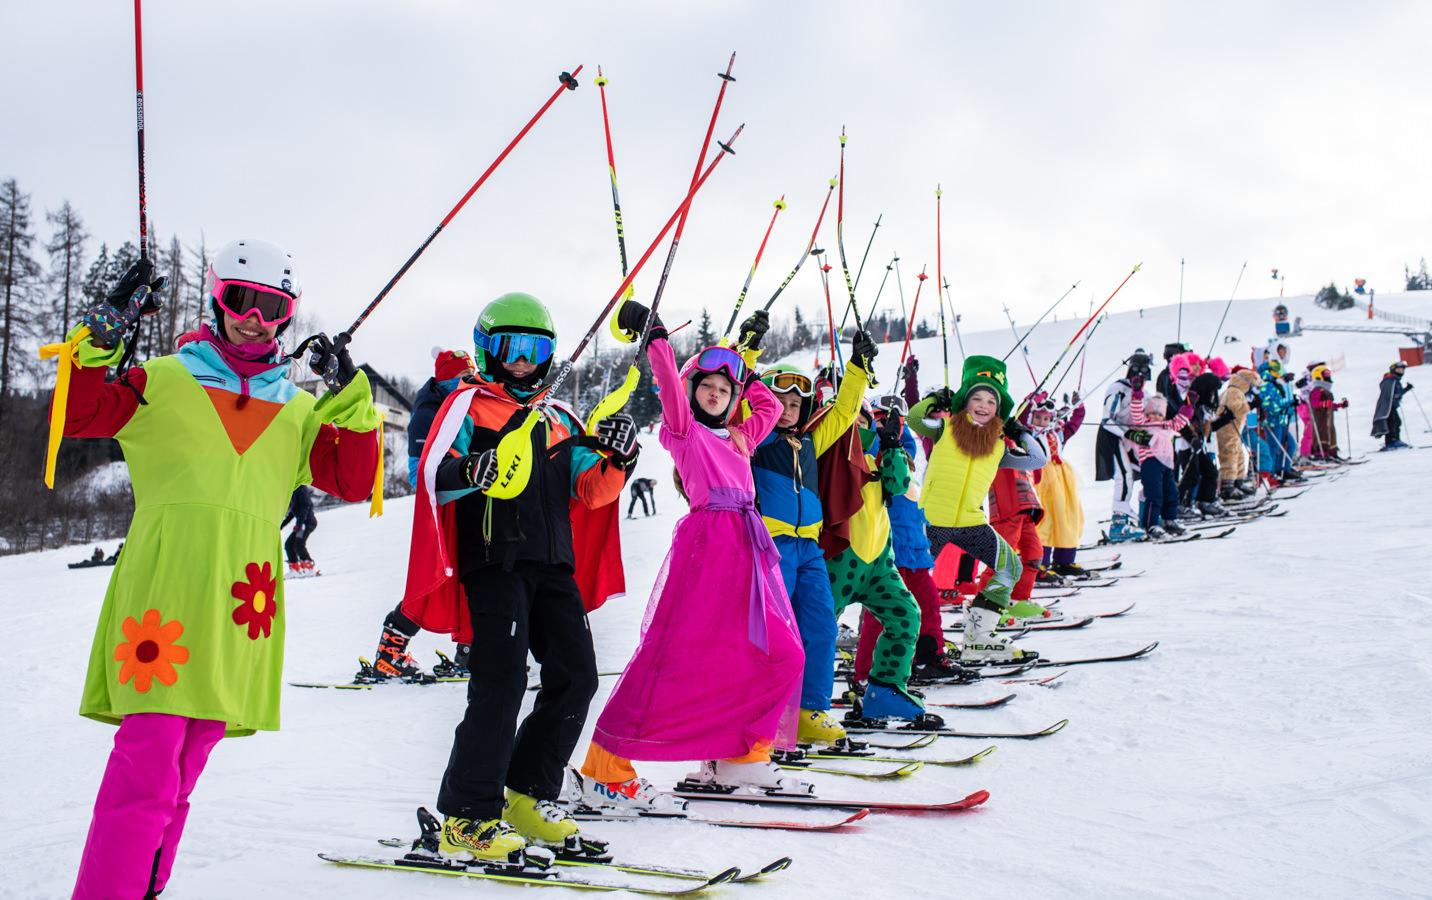 Cum a fost la World Snow Day, la Vatra Dornei (2021) (fotoreportaj)